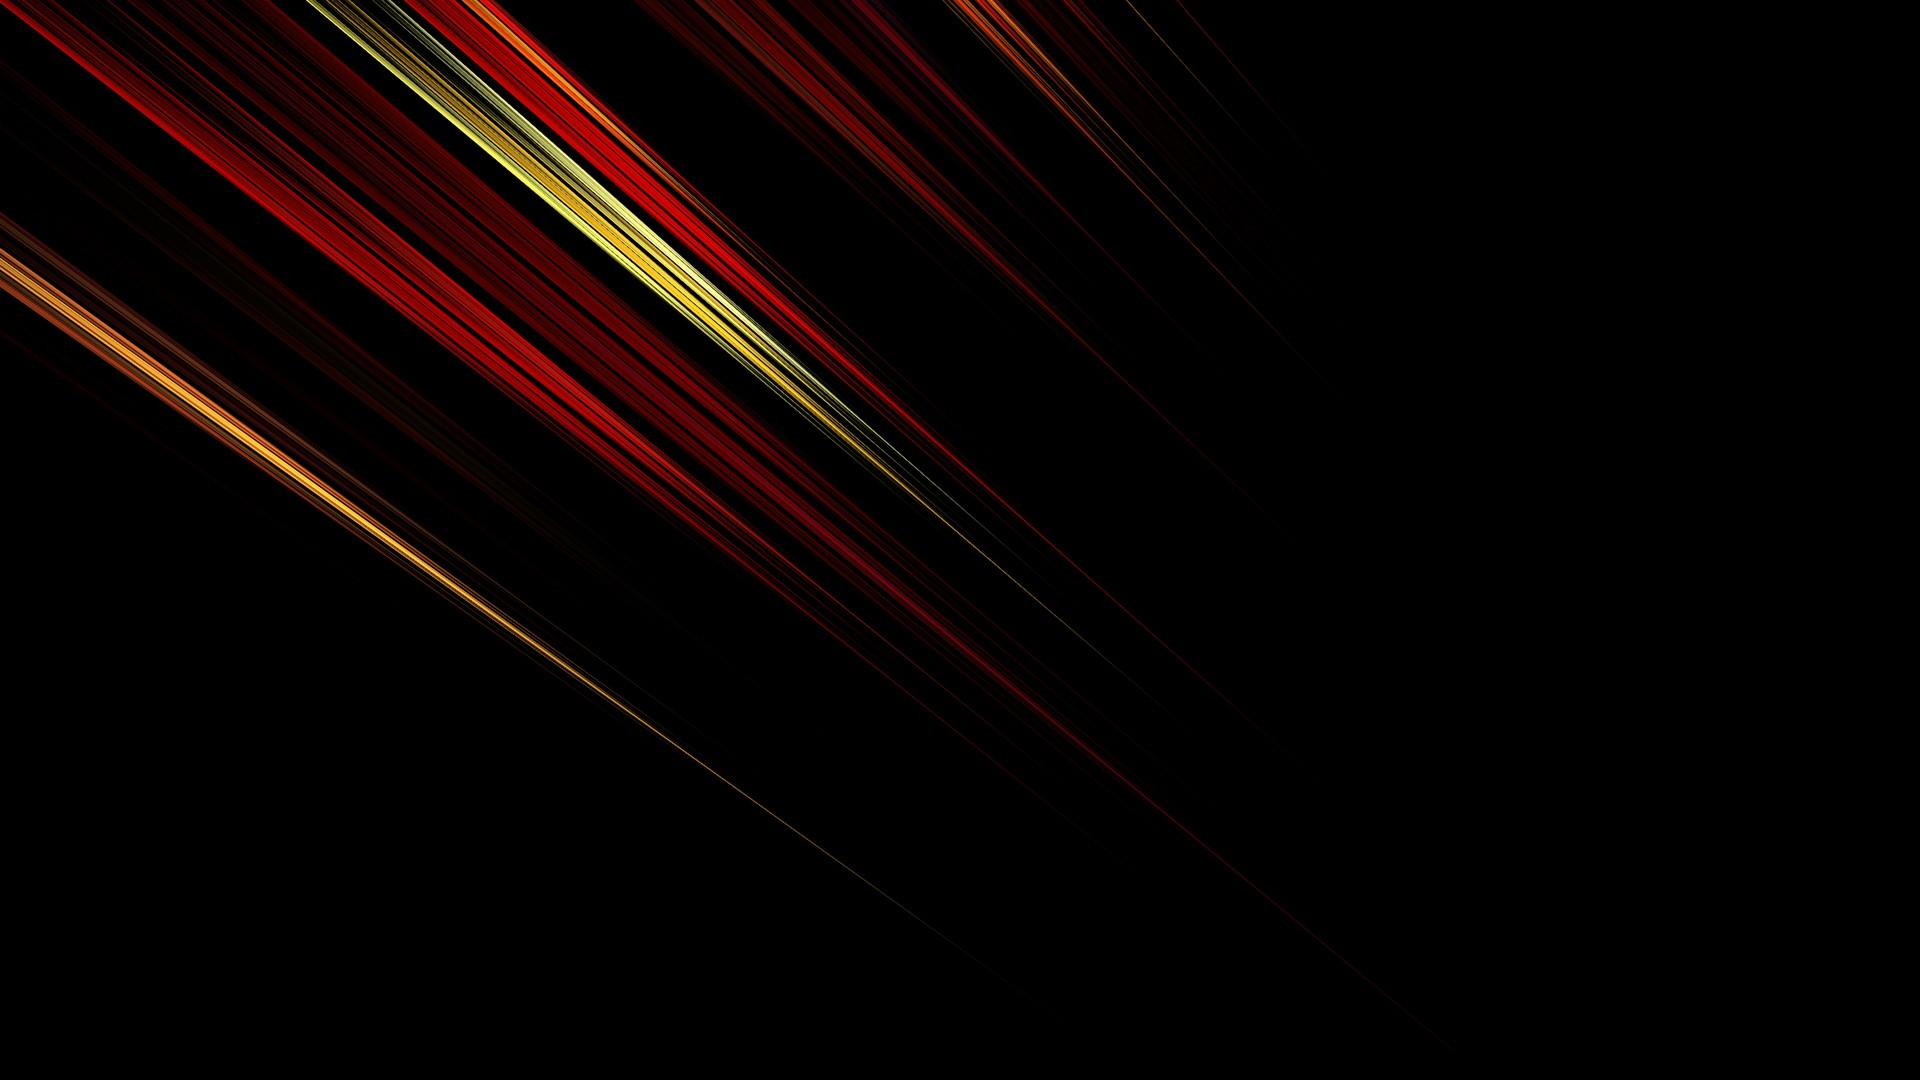 Black Abstract desktop image